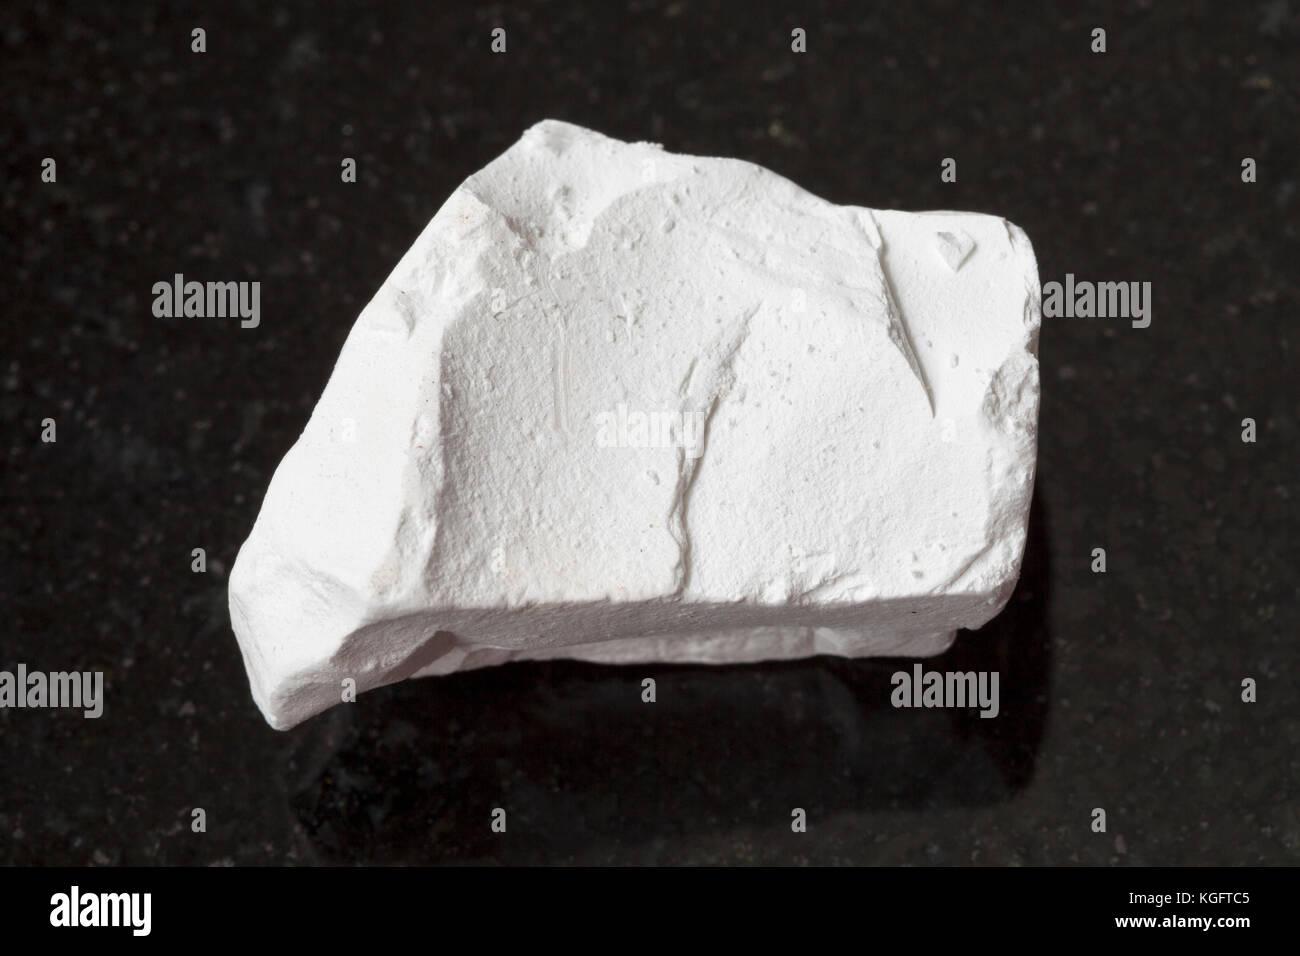 macro shooting of natural mineral rock specimen - raw chalk stone on dark granite background - Stock Image